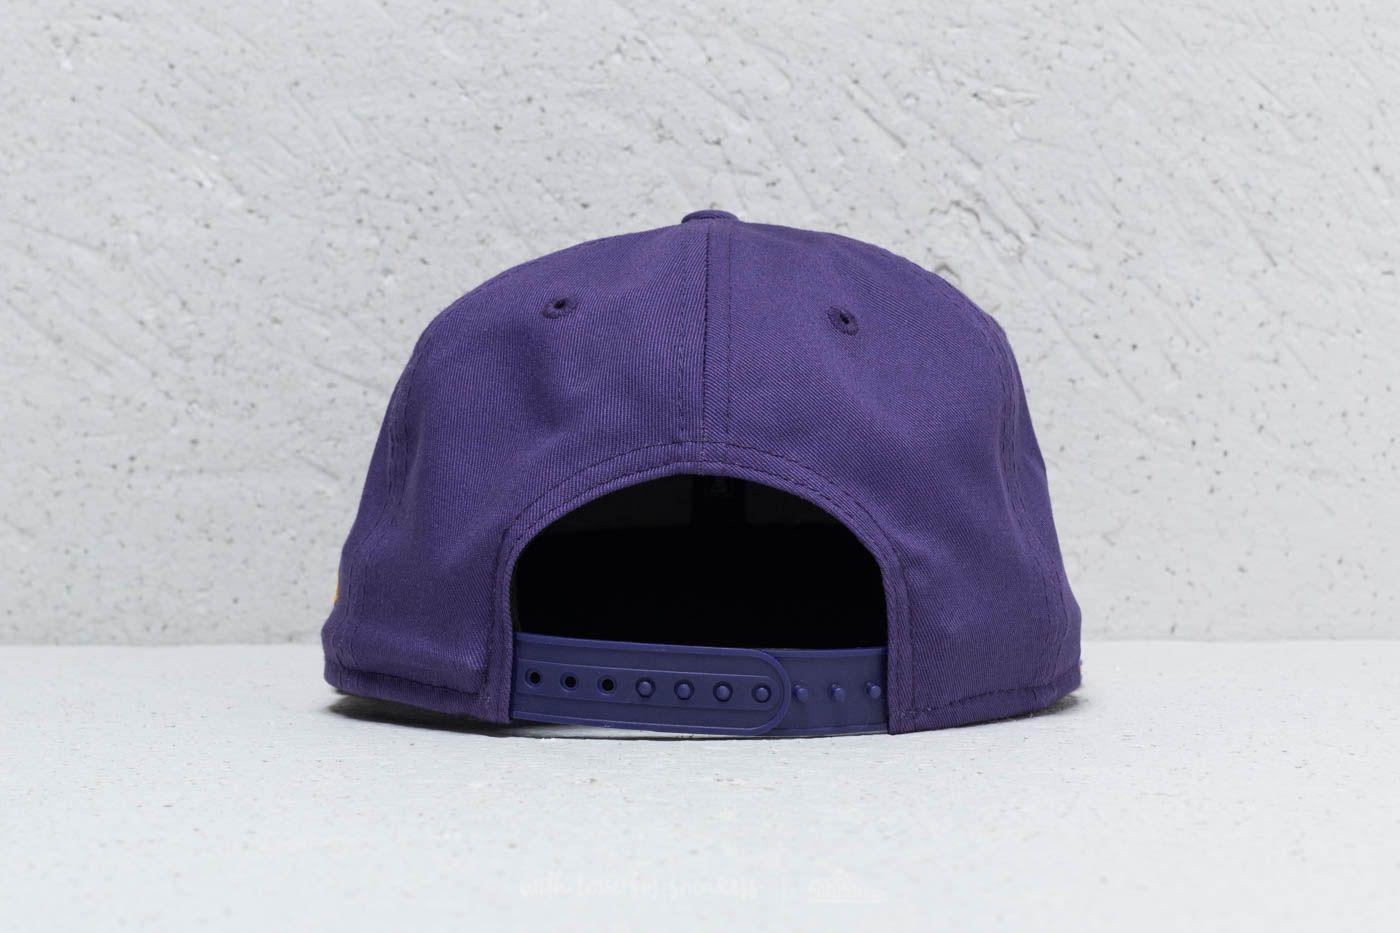 a95ff865abf Lyst - KTZ 9fifty Nba Los Angeles Lakers Cap Purple in Purple for Men